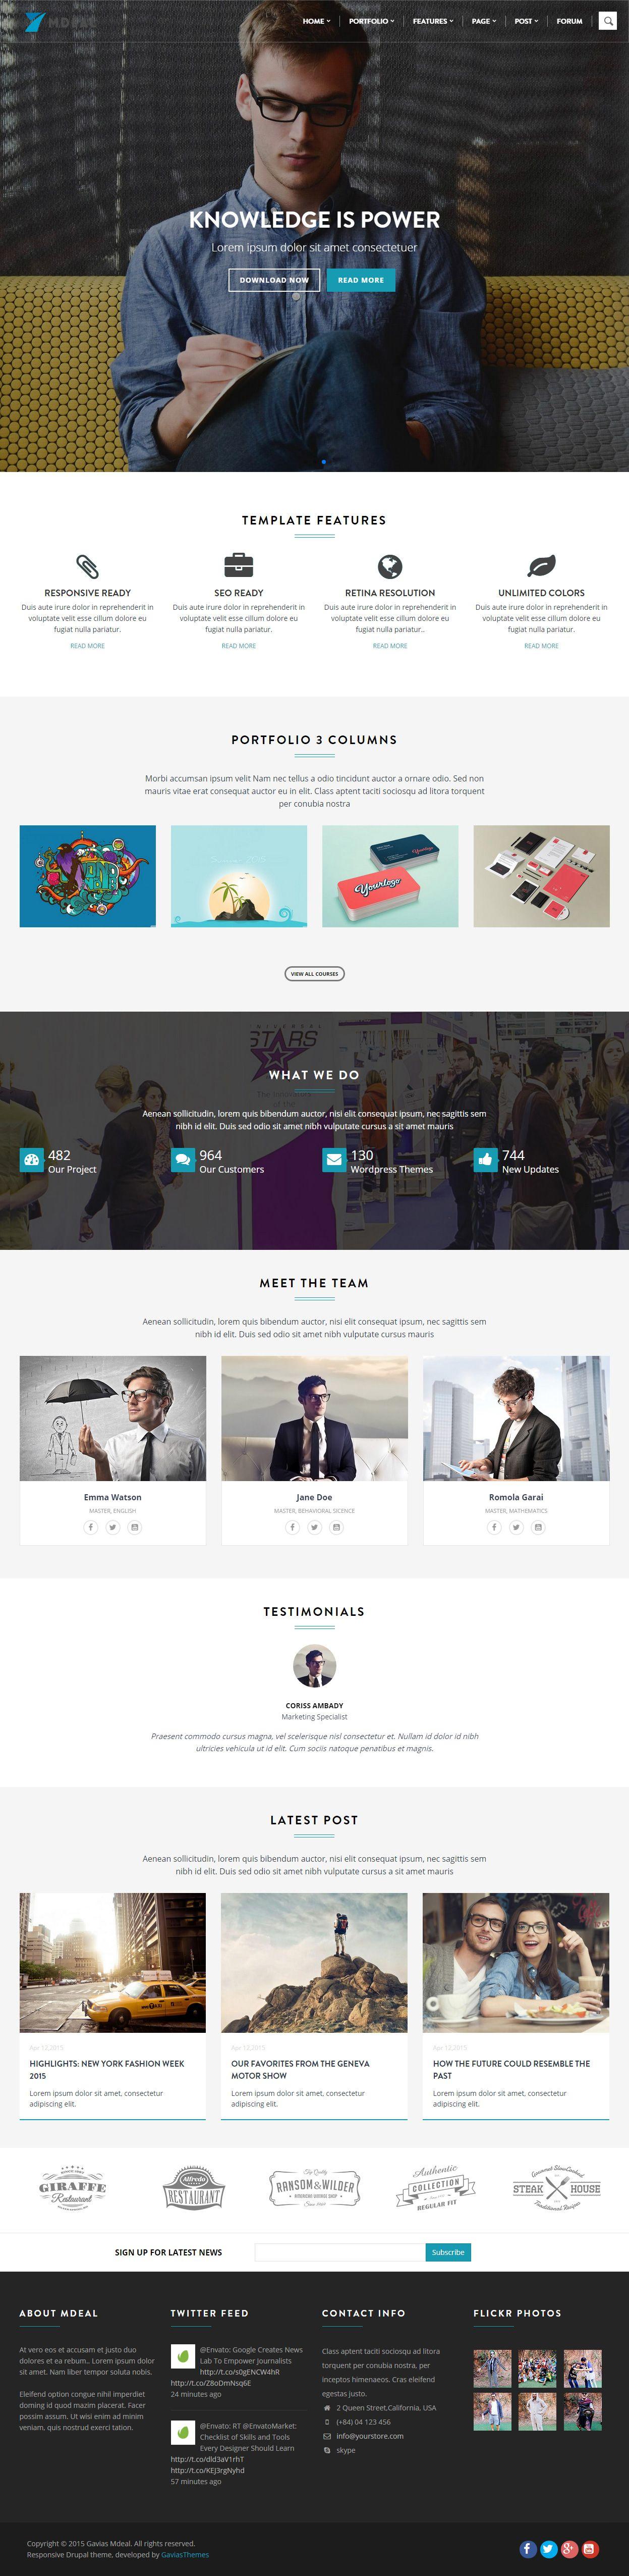 Mdeal Premium Responsive Business Drupal Theme In 2020 Drupal Web Layout Design Theme